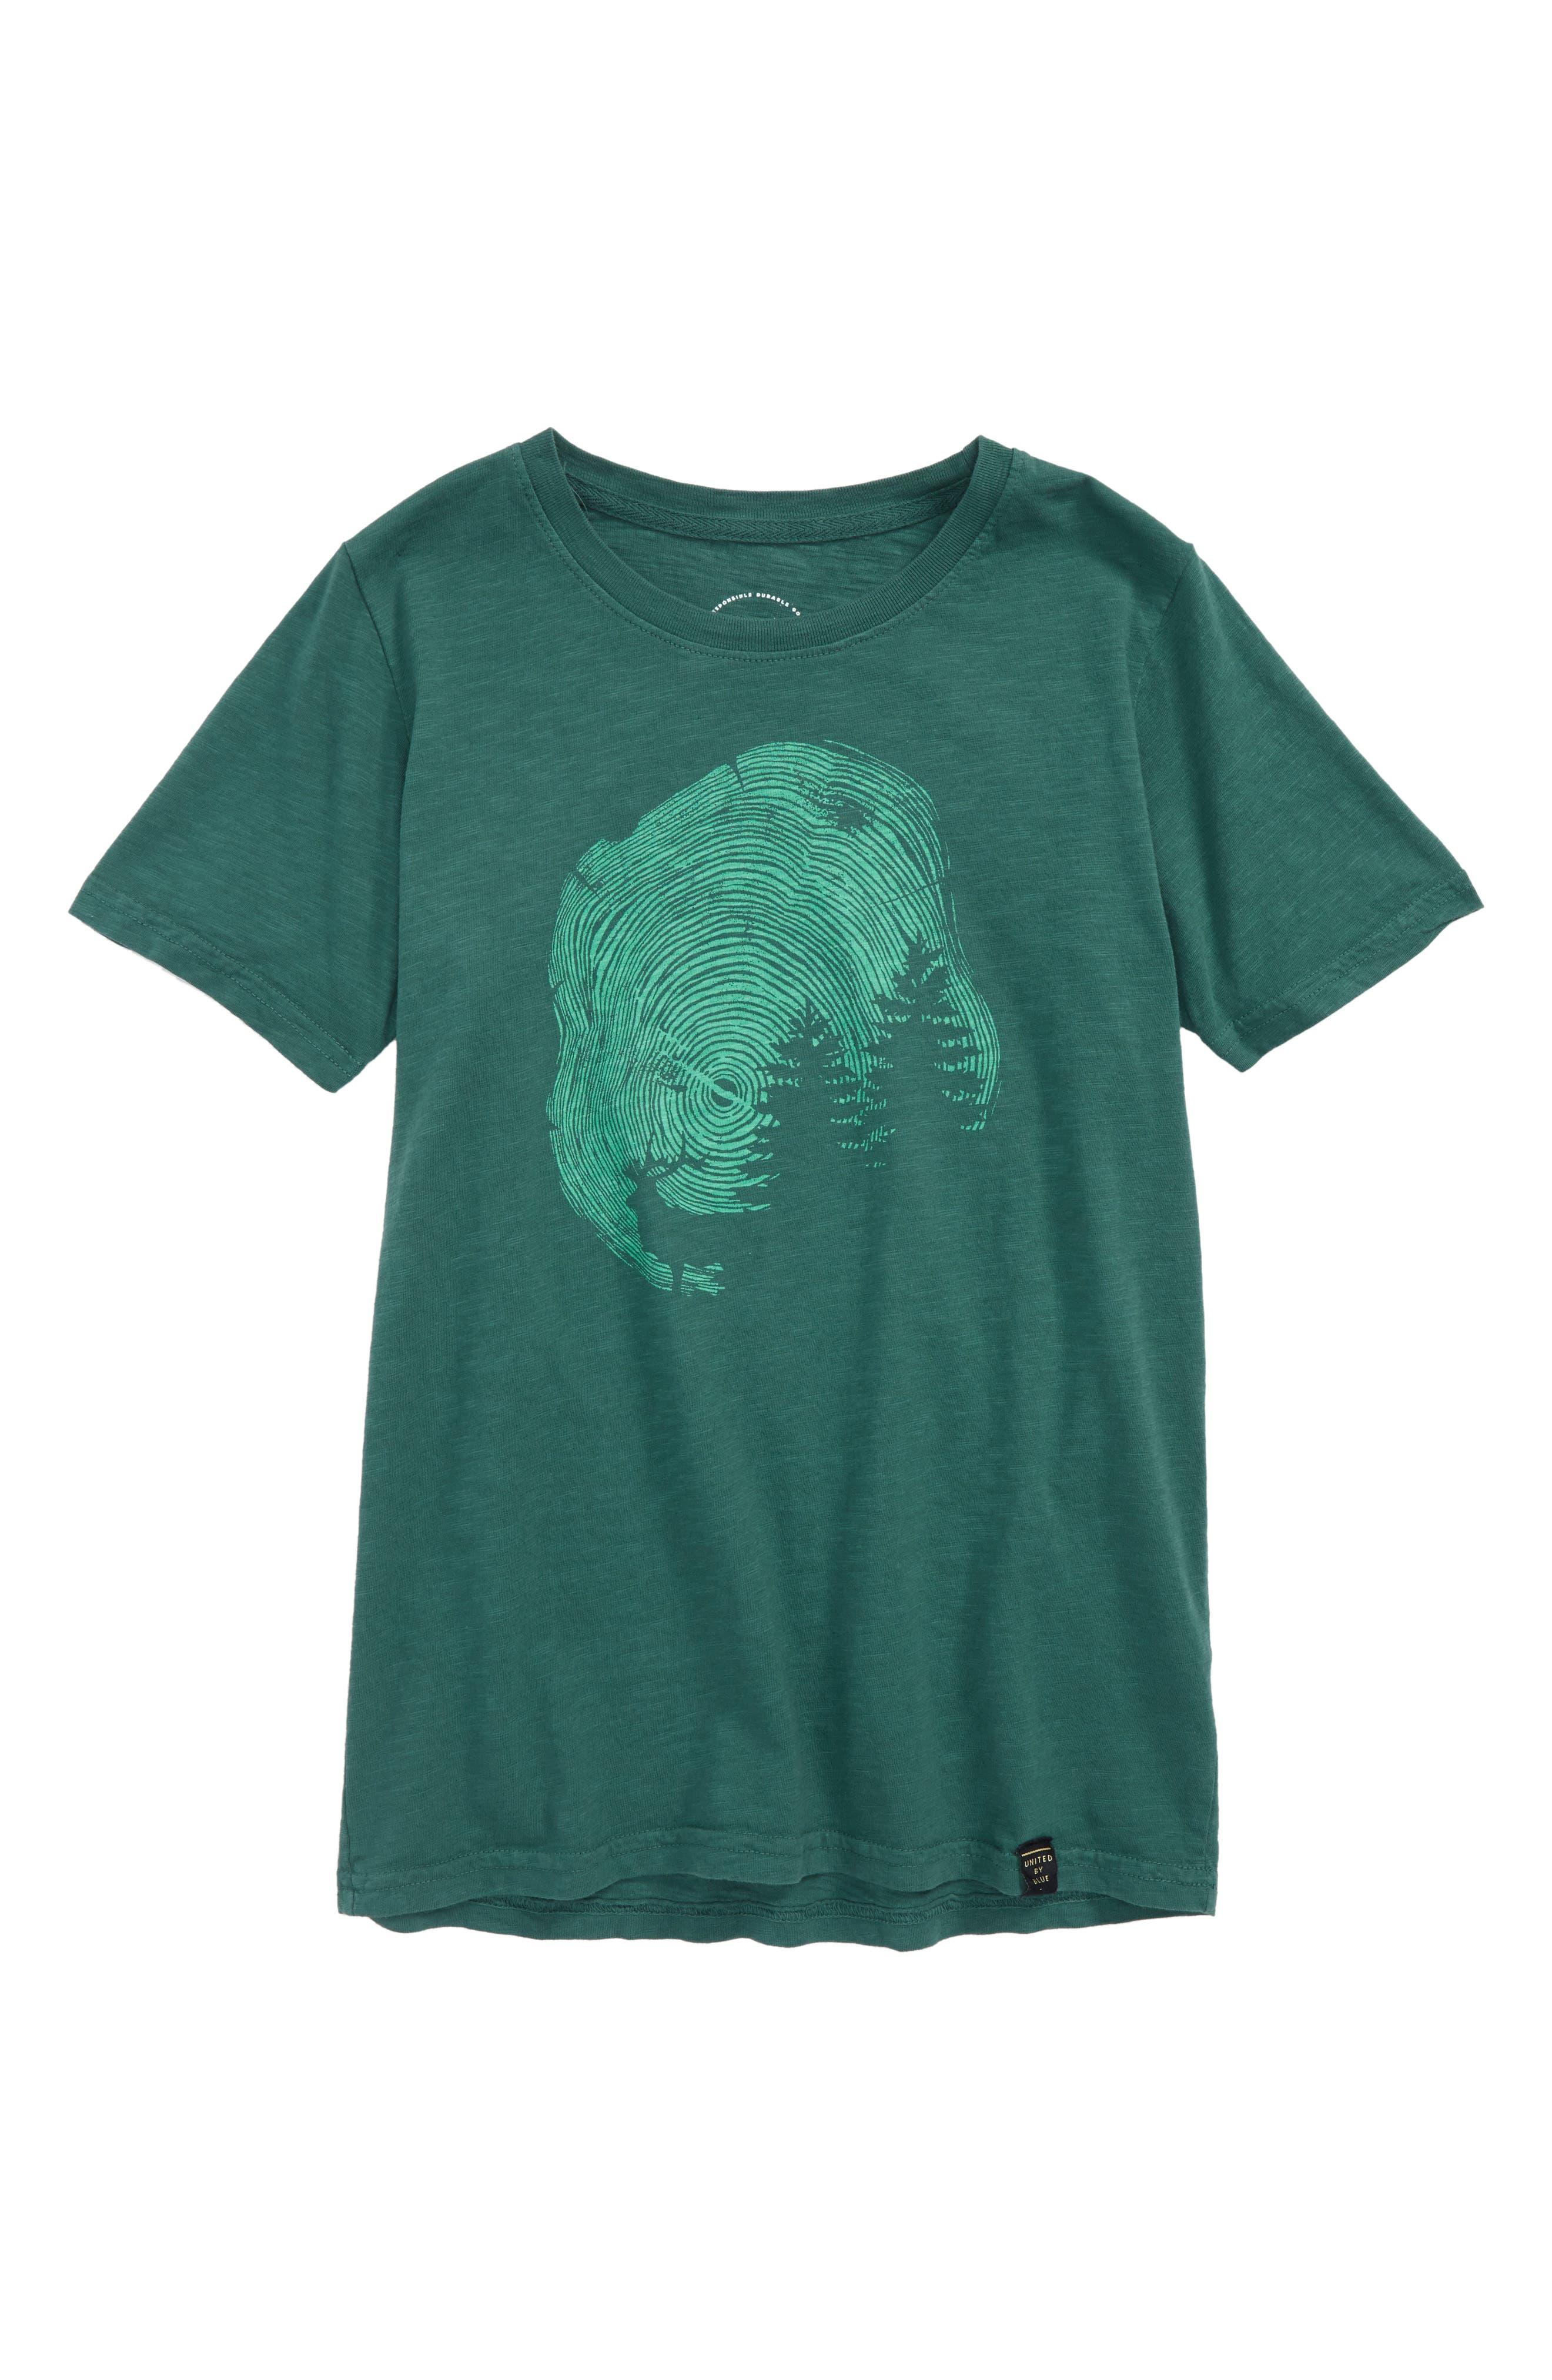 Gorham Organic Cotton T-Shirt,                             Main thumbnail 1, color,                             440